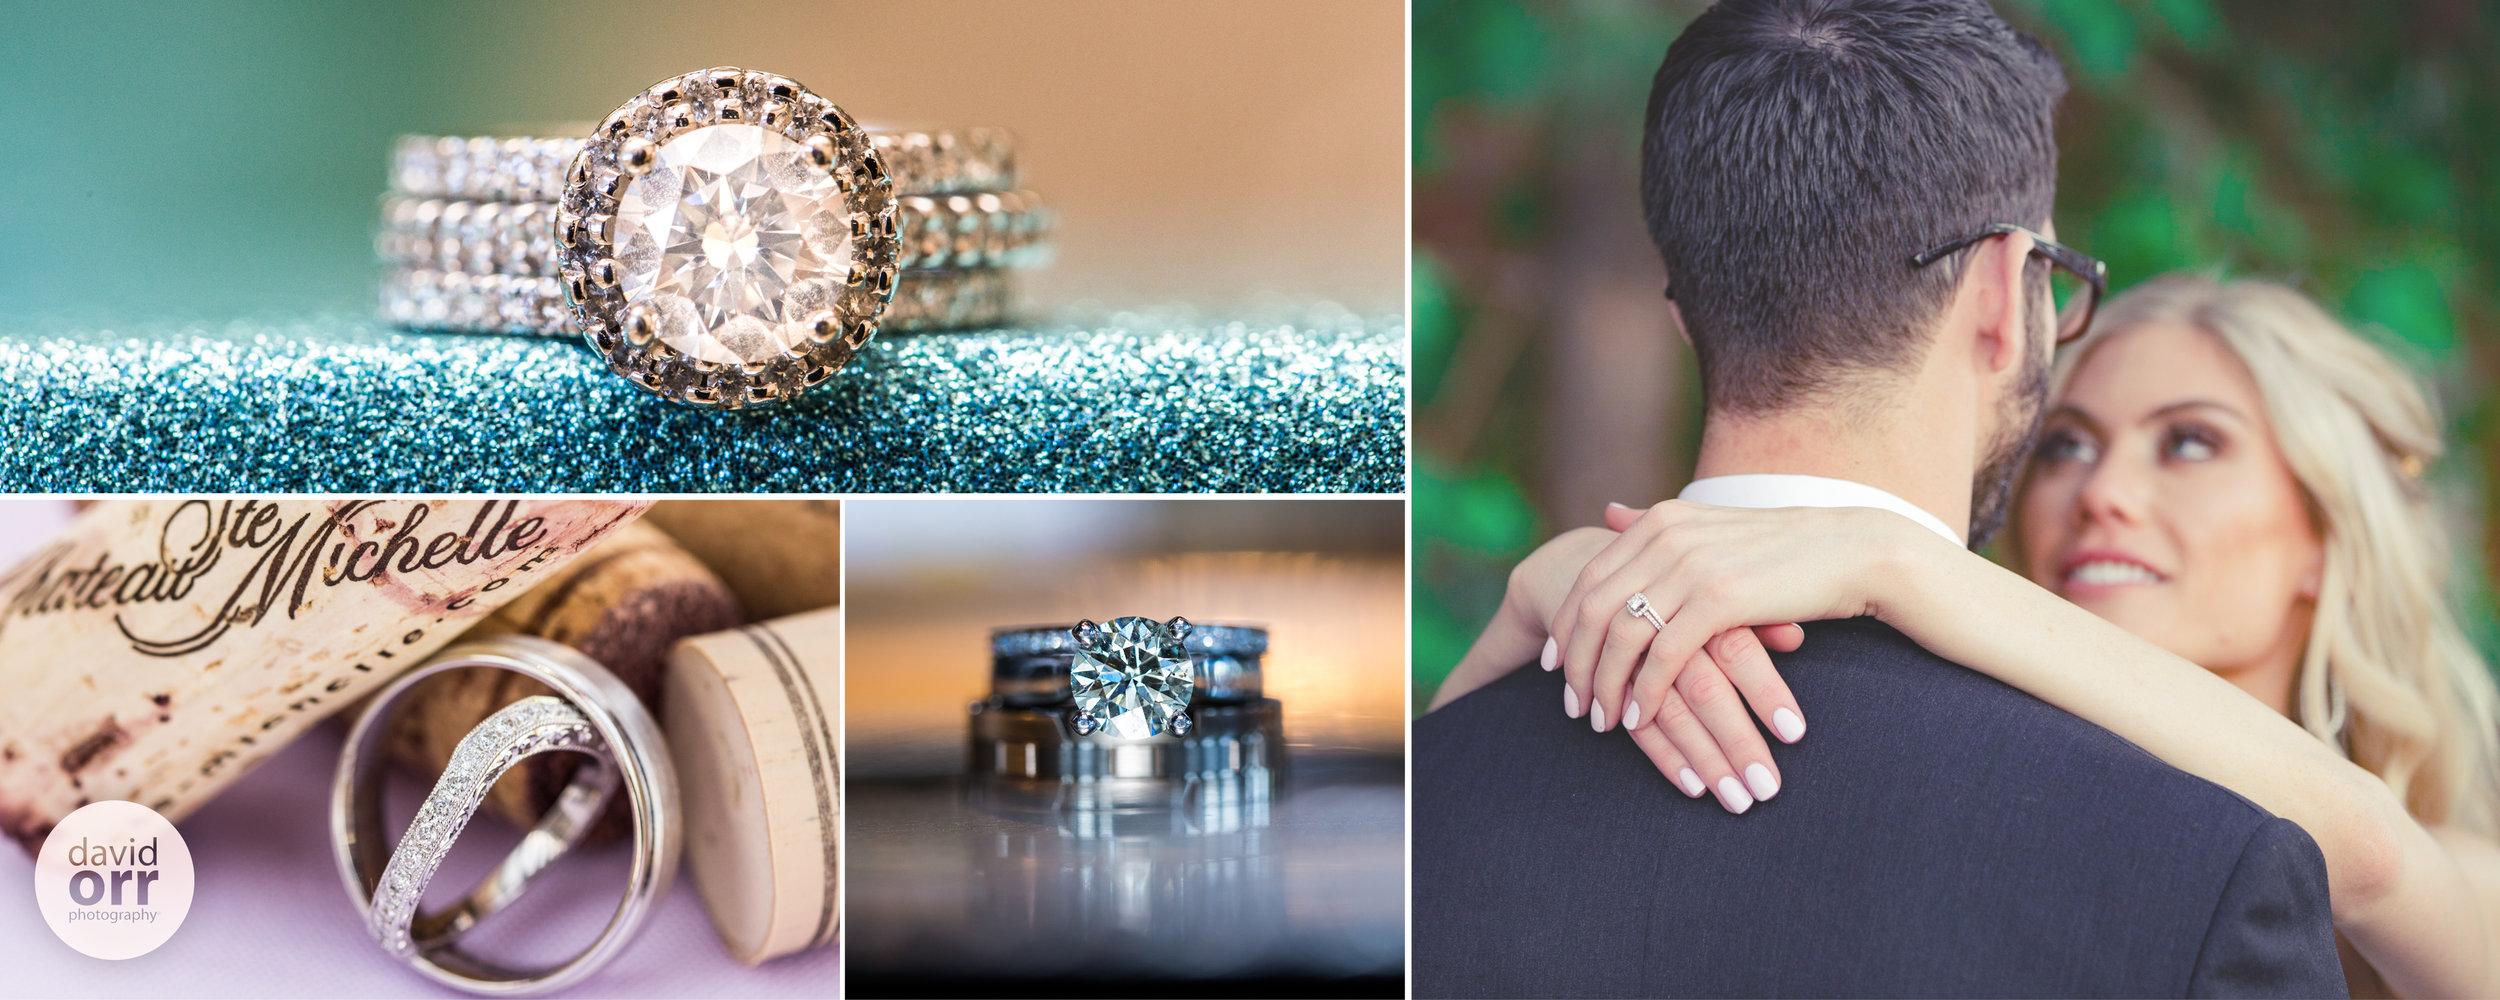 DavidOrrPhotography_Wedding-Engagement-Rings.jpg